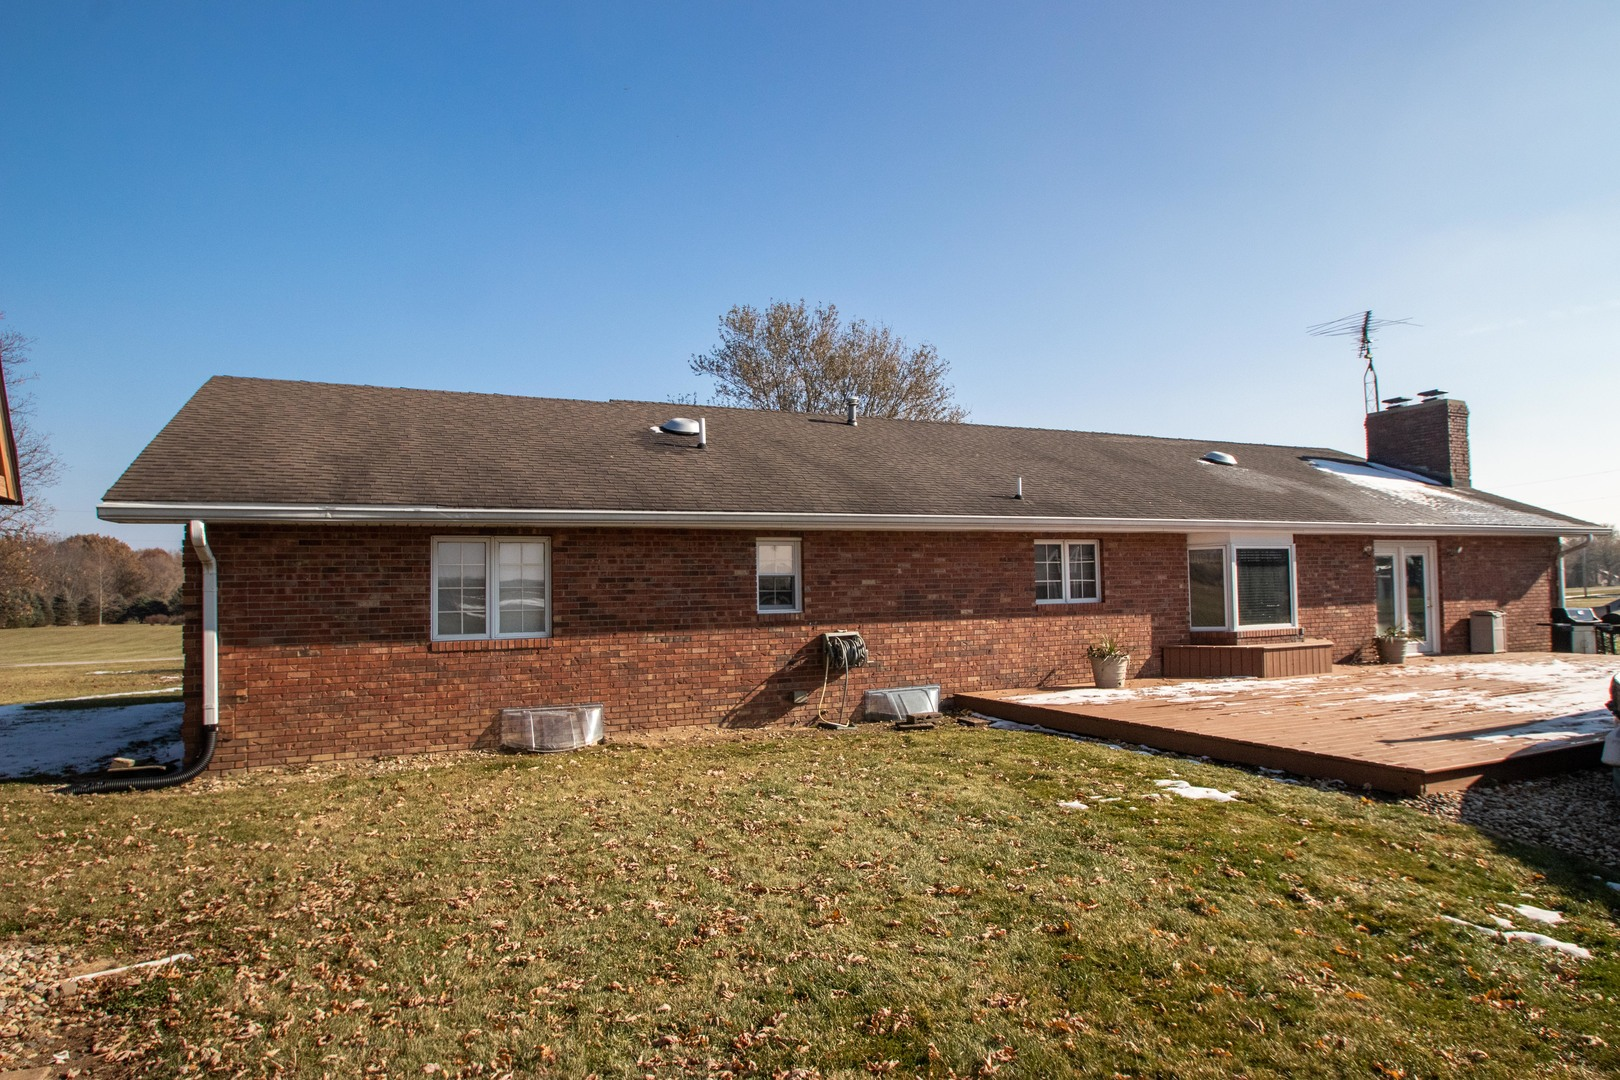 29944 North 1728 East, Alvin, Illinois, 61811